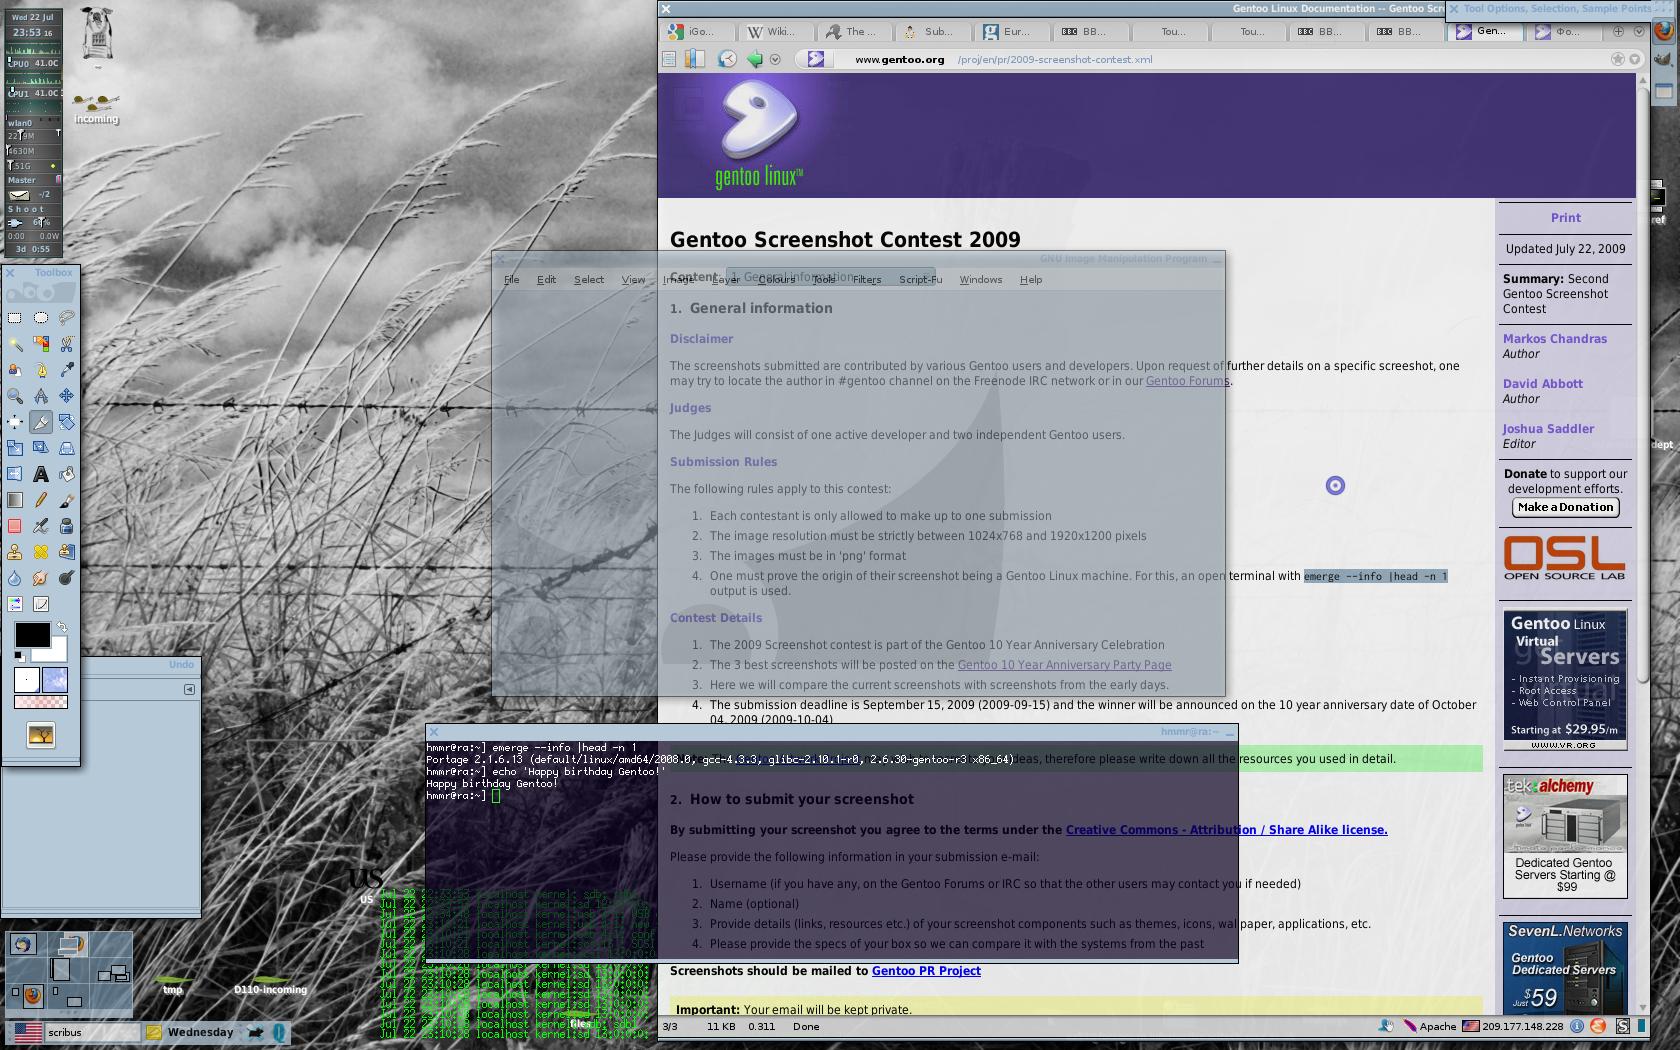 linux administration handbook pdf free download